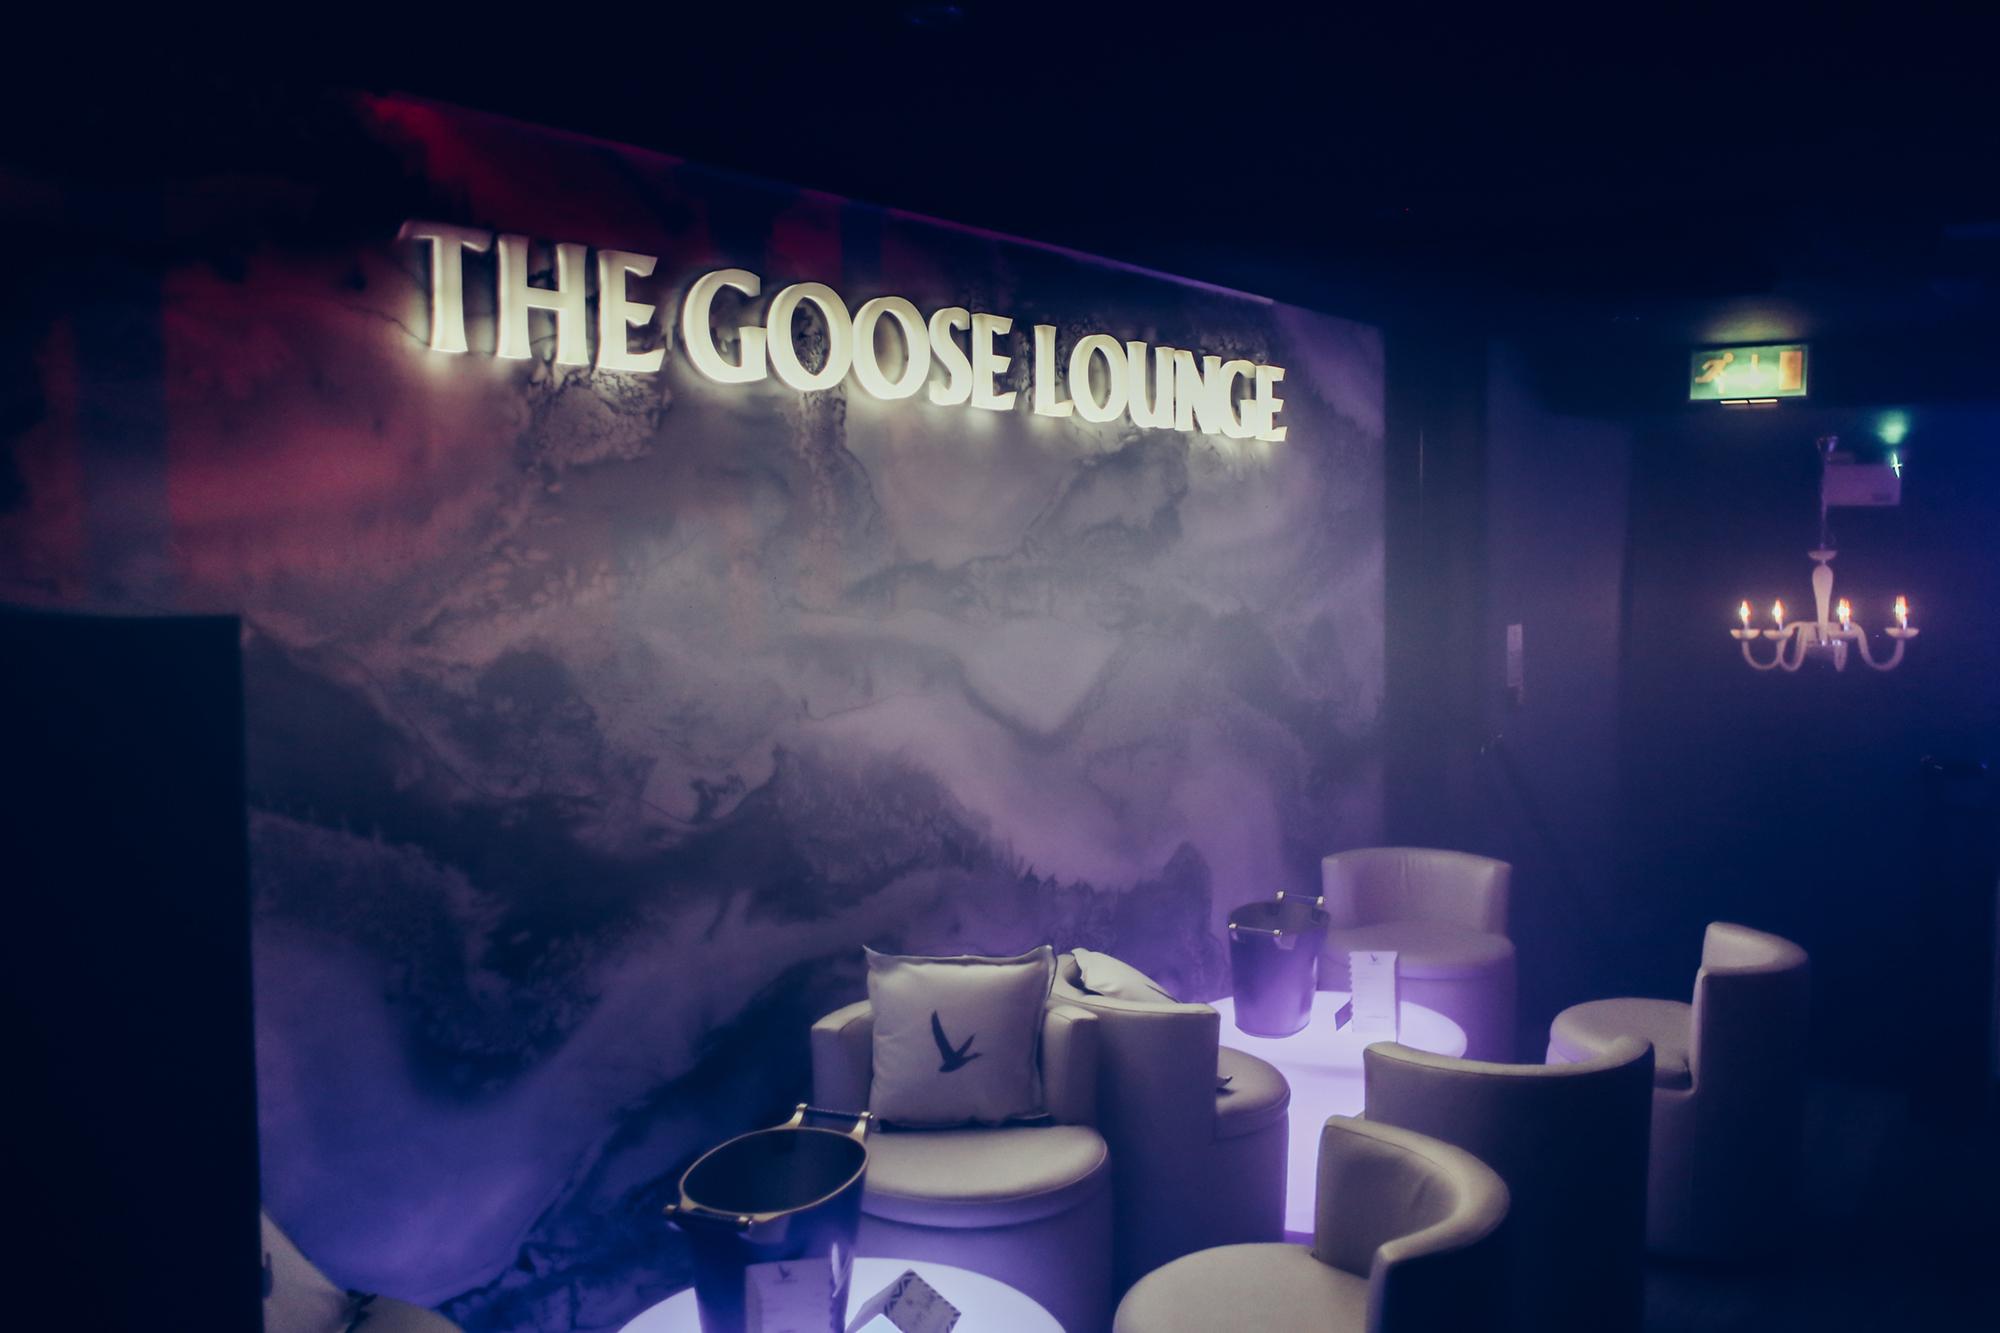 the_goose_lounge_01.jpg